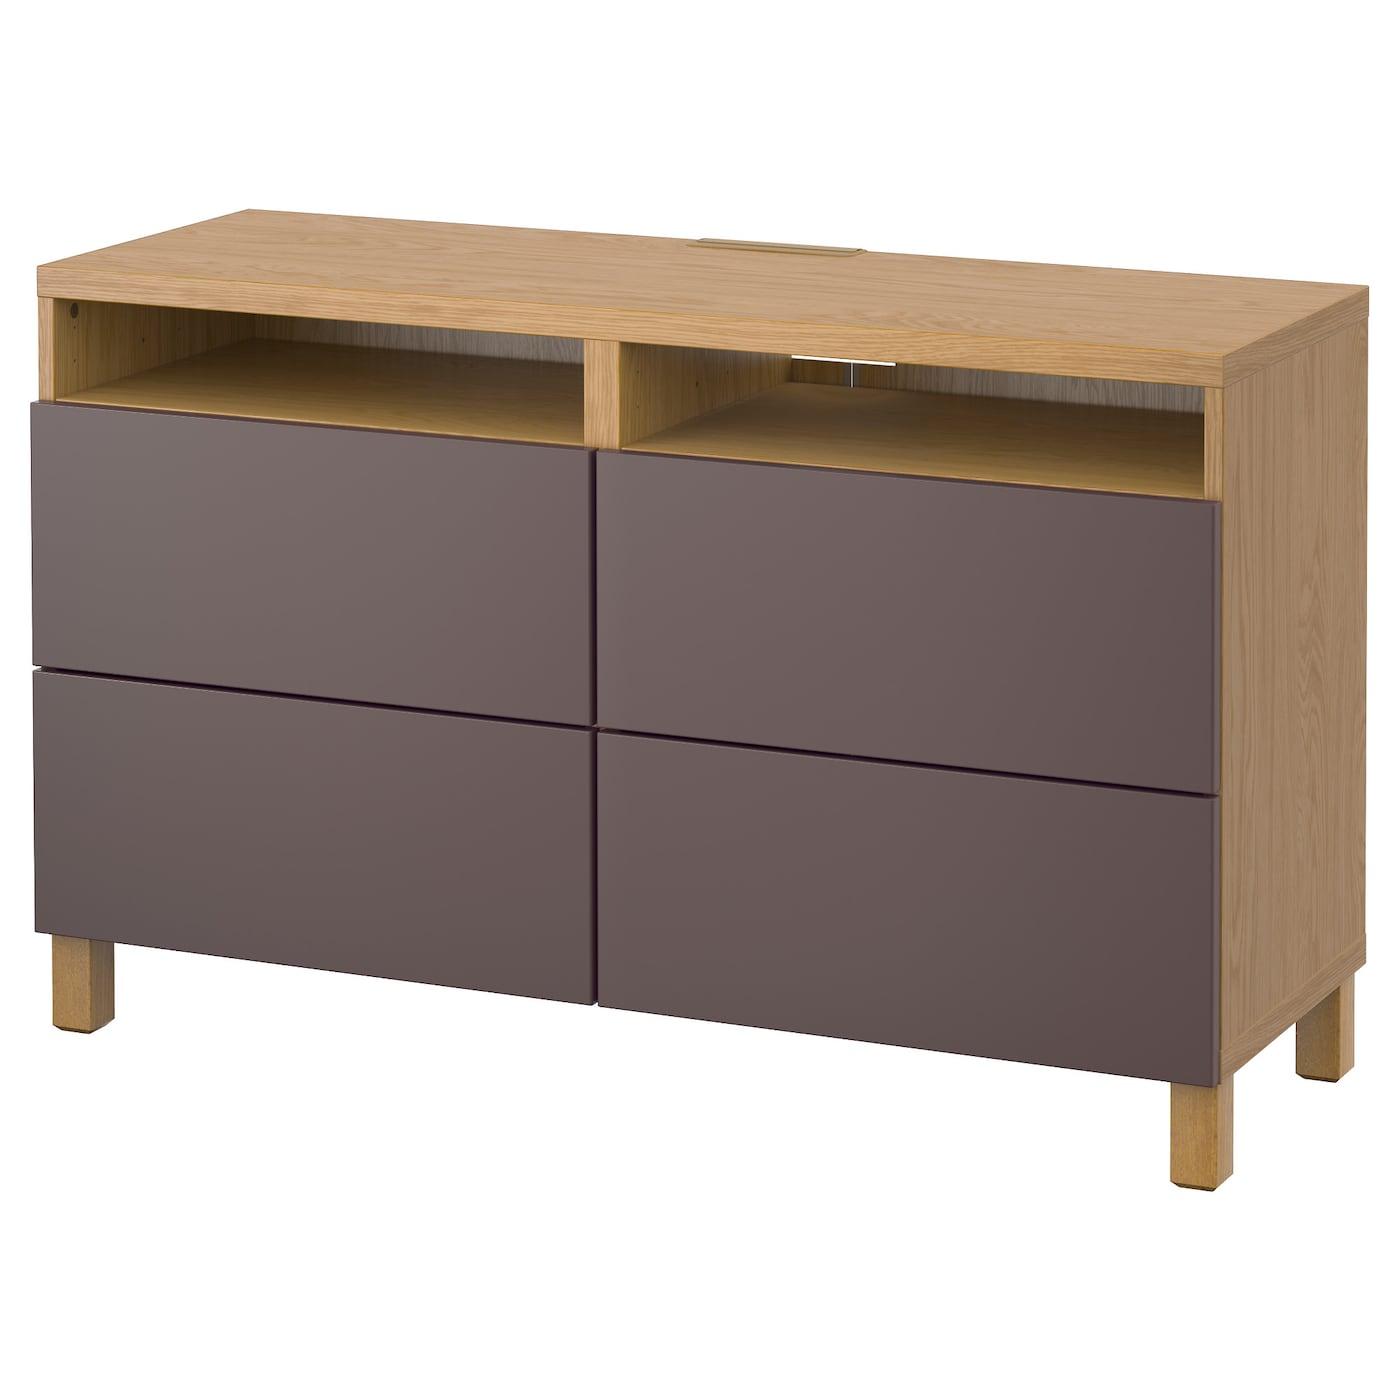 Best Tv Bench With Drawers Oak Effect Valviken Dark Brown 120x40x74 Cm Ikea